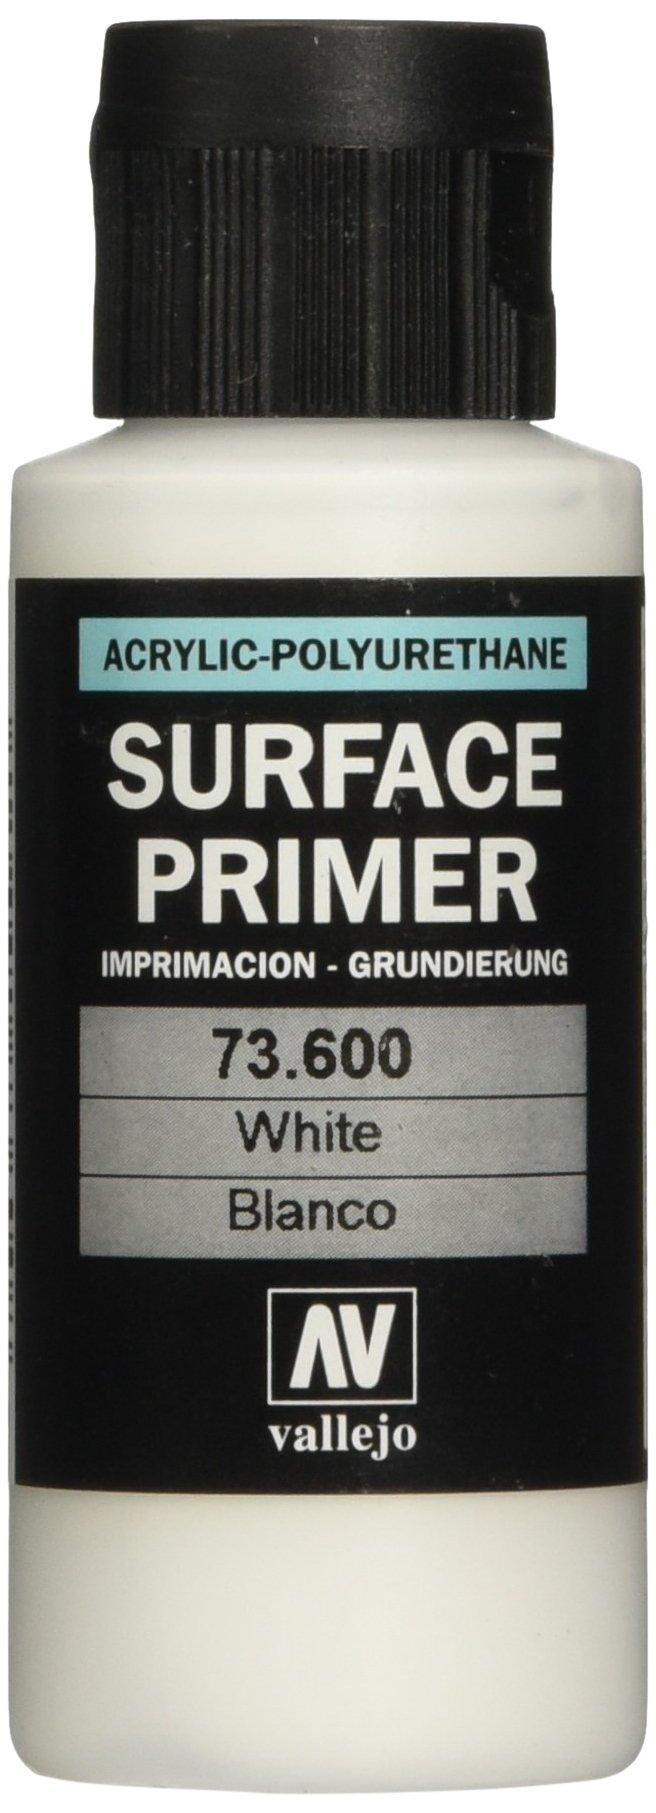 Vallejo White Primer Acrylic Polyurethane, 60ml